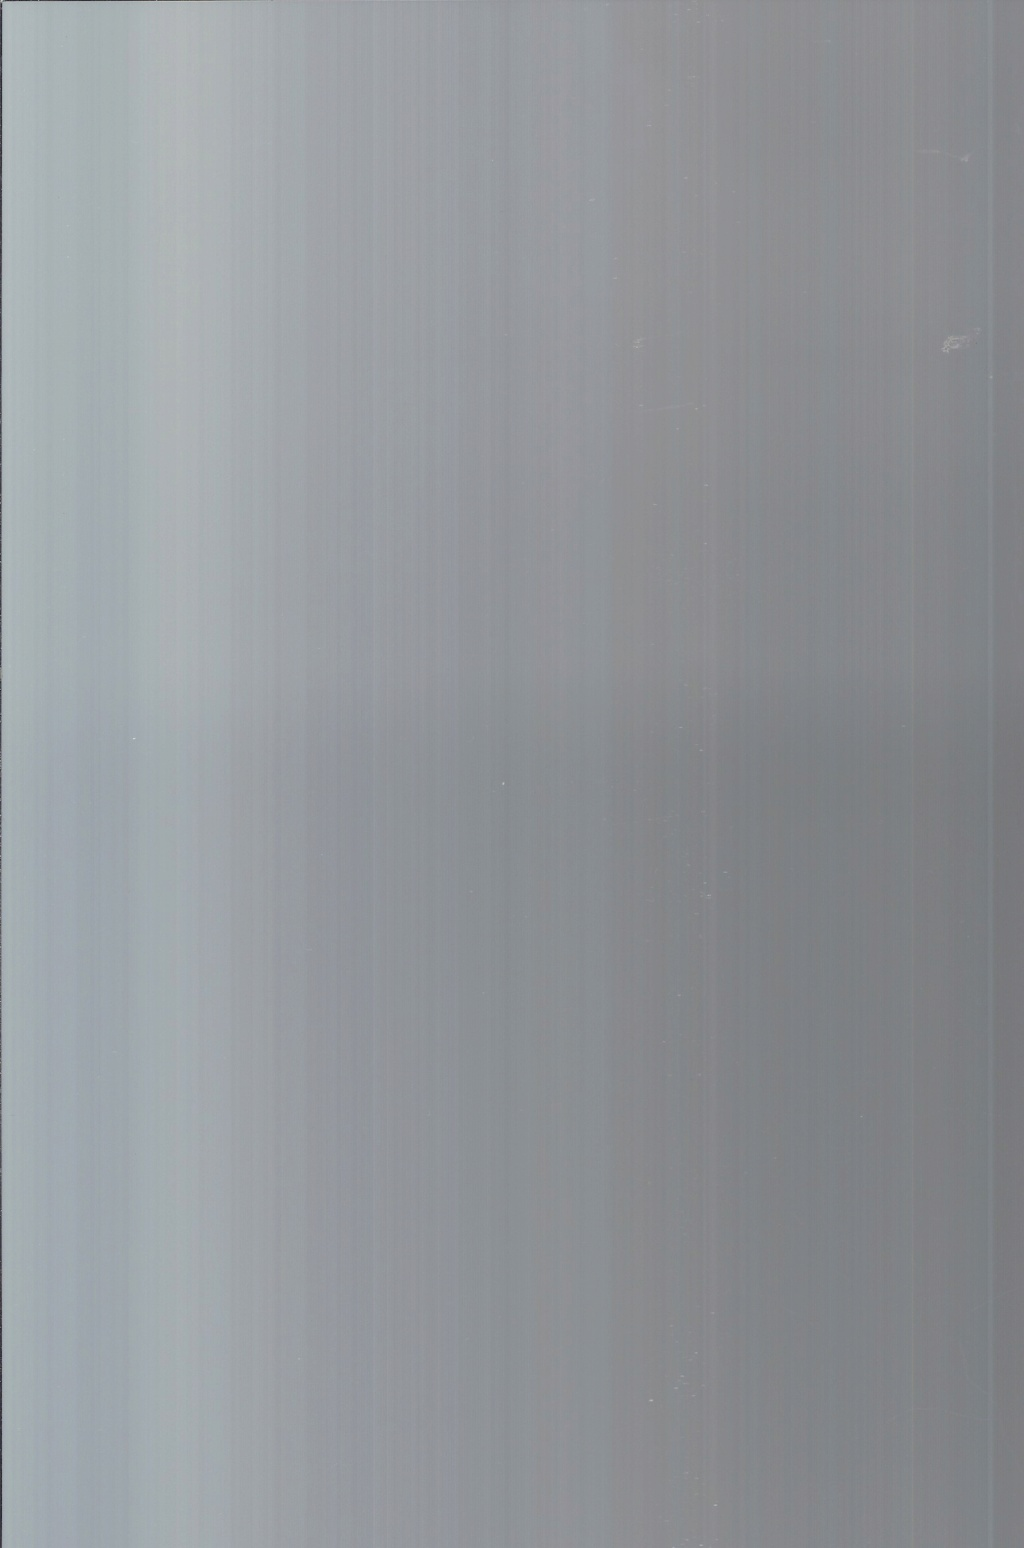 [AIRFIX 2013] Catalogue 2013 Airf1770